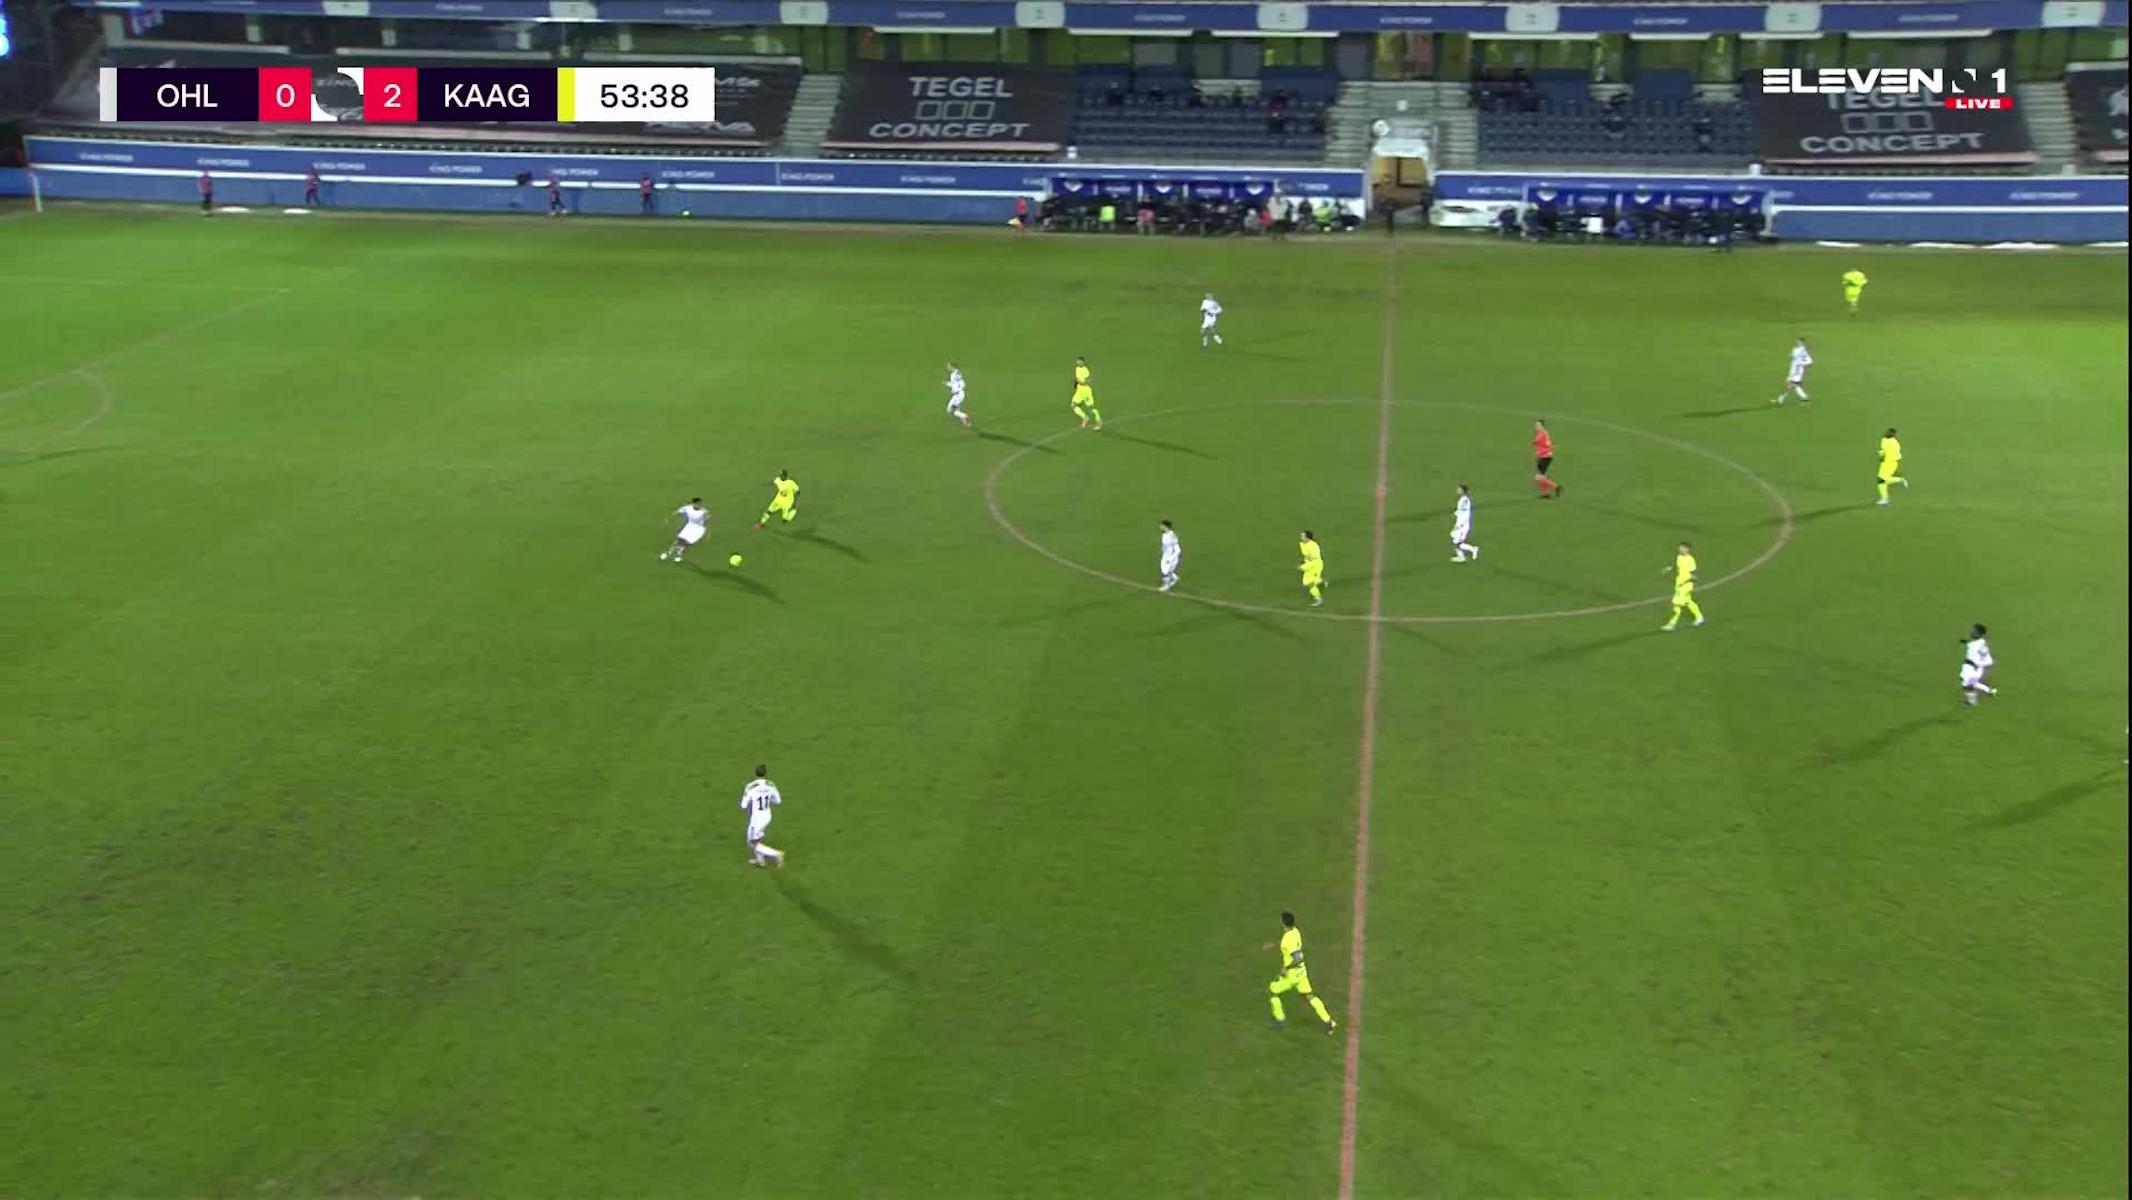 Doelpunt Osman Bukari (OH Leuven vs. KAA Gent)